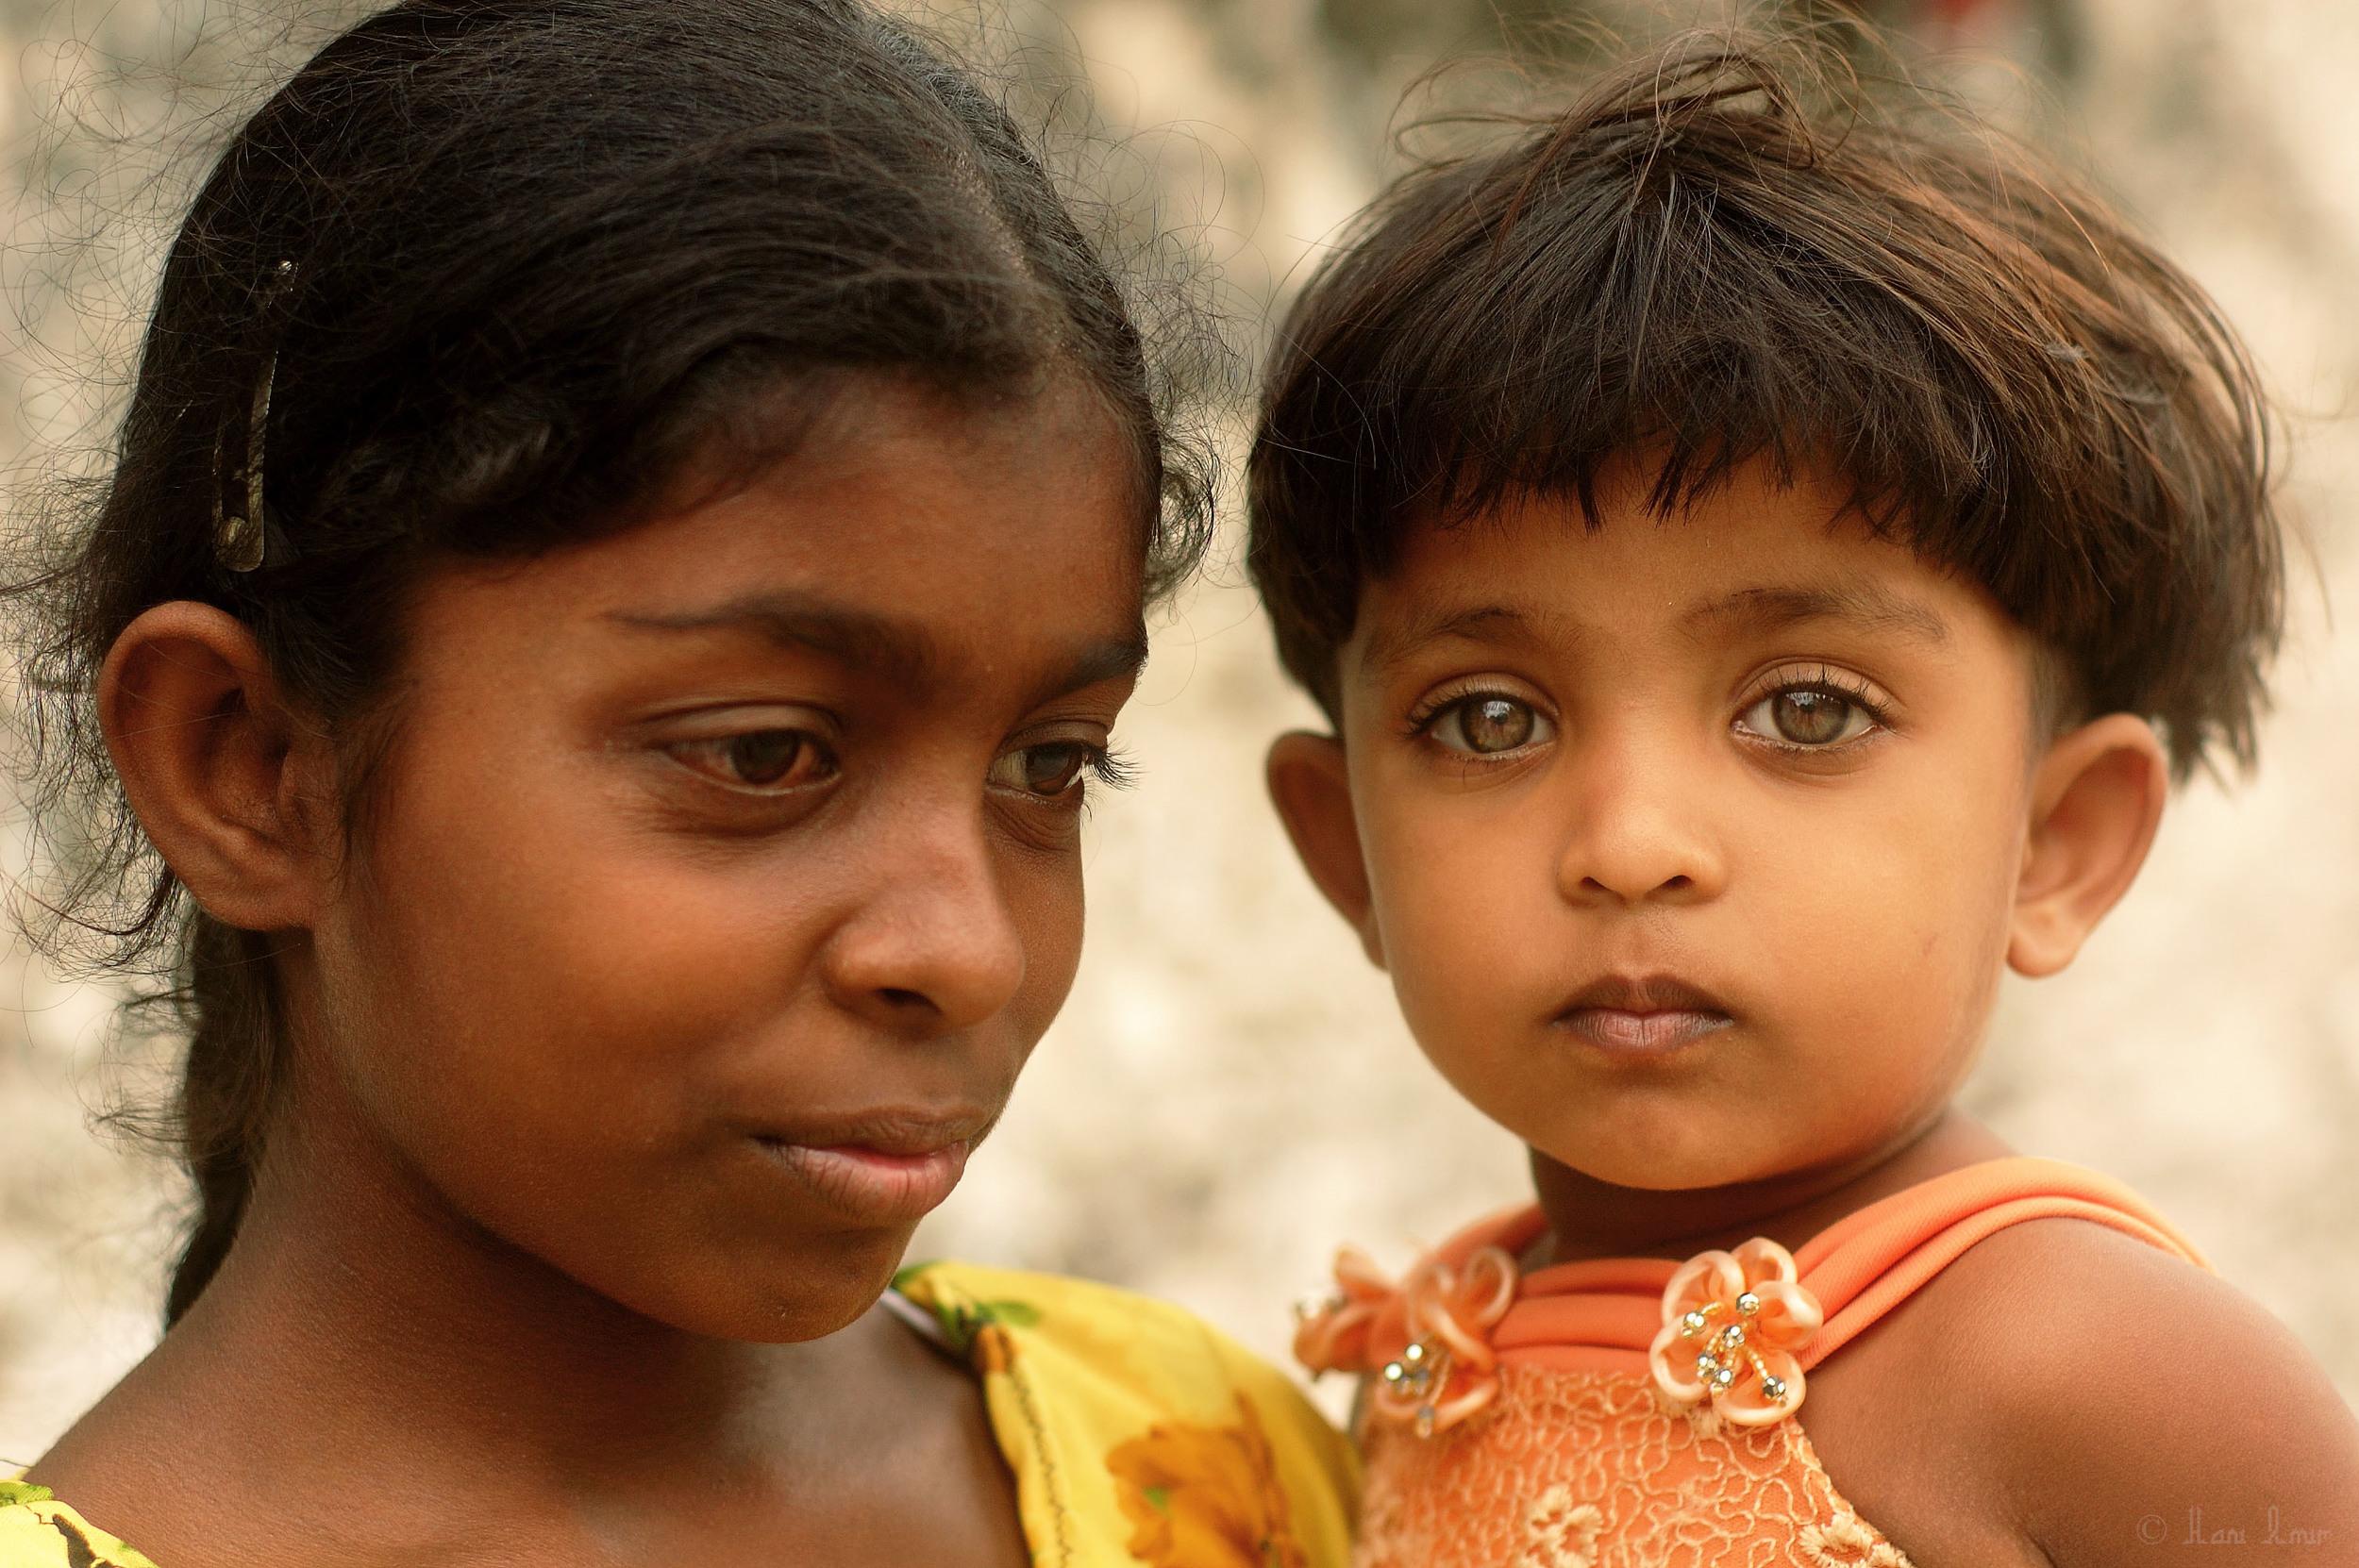 The daughters of one of the fishermen from Kudarikilu.